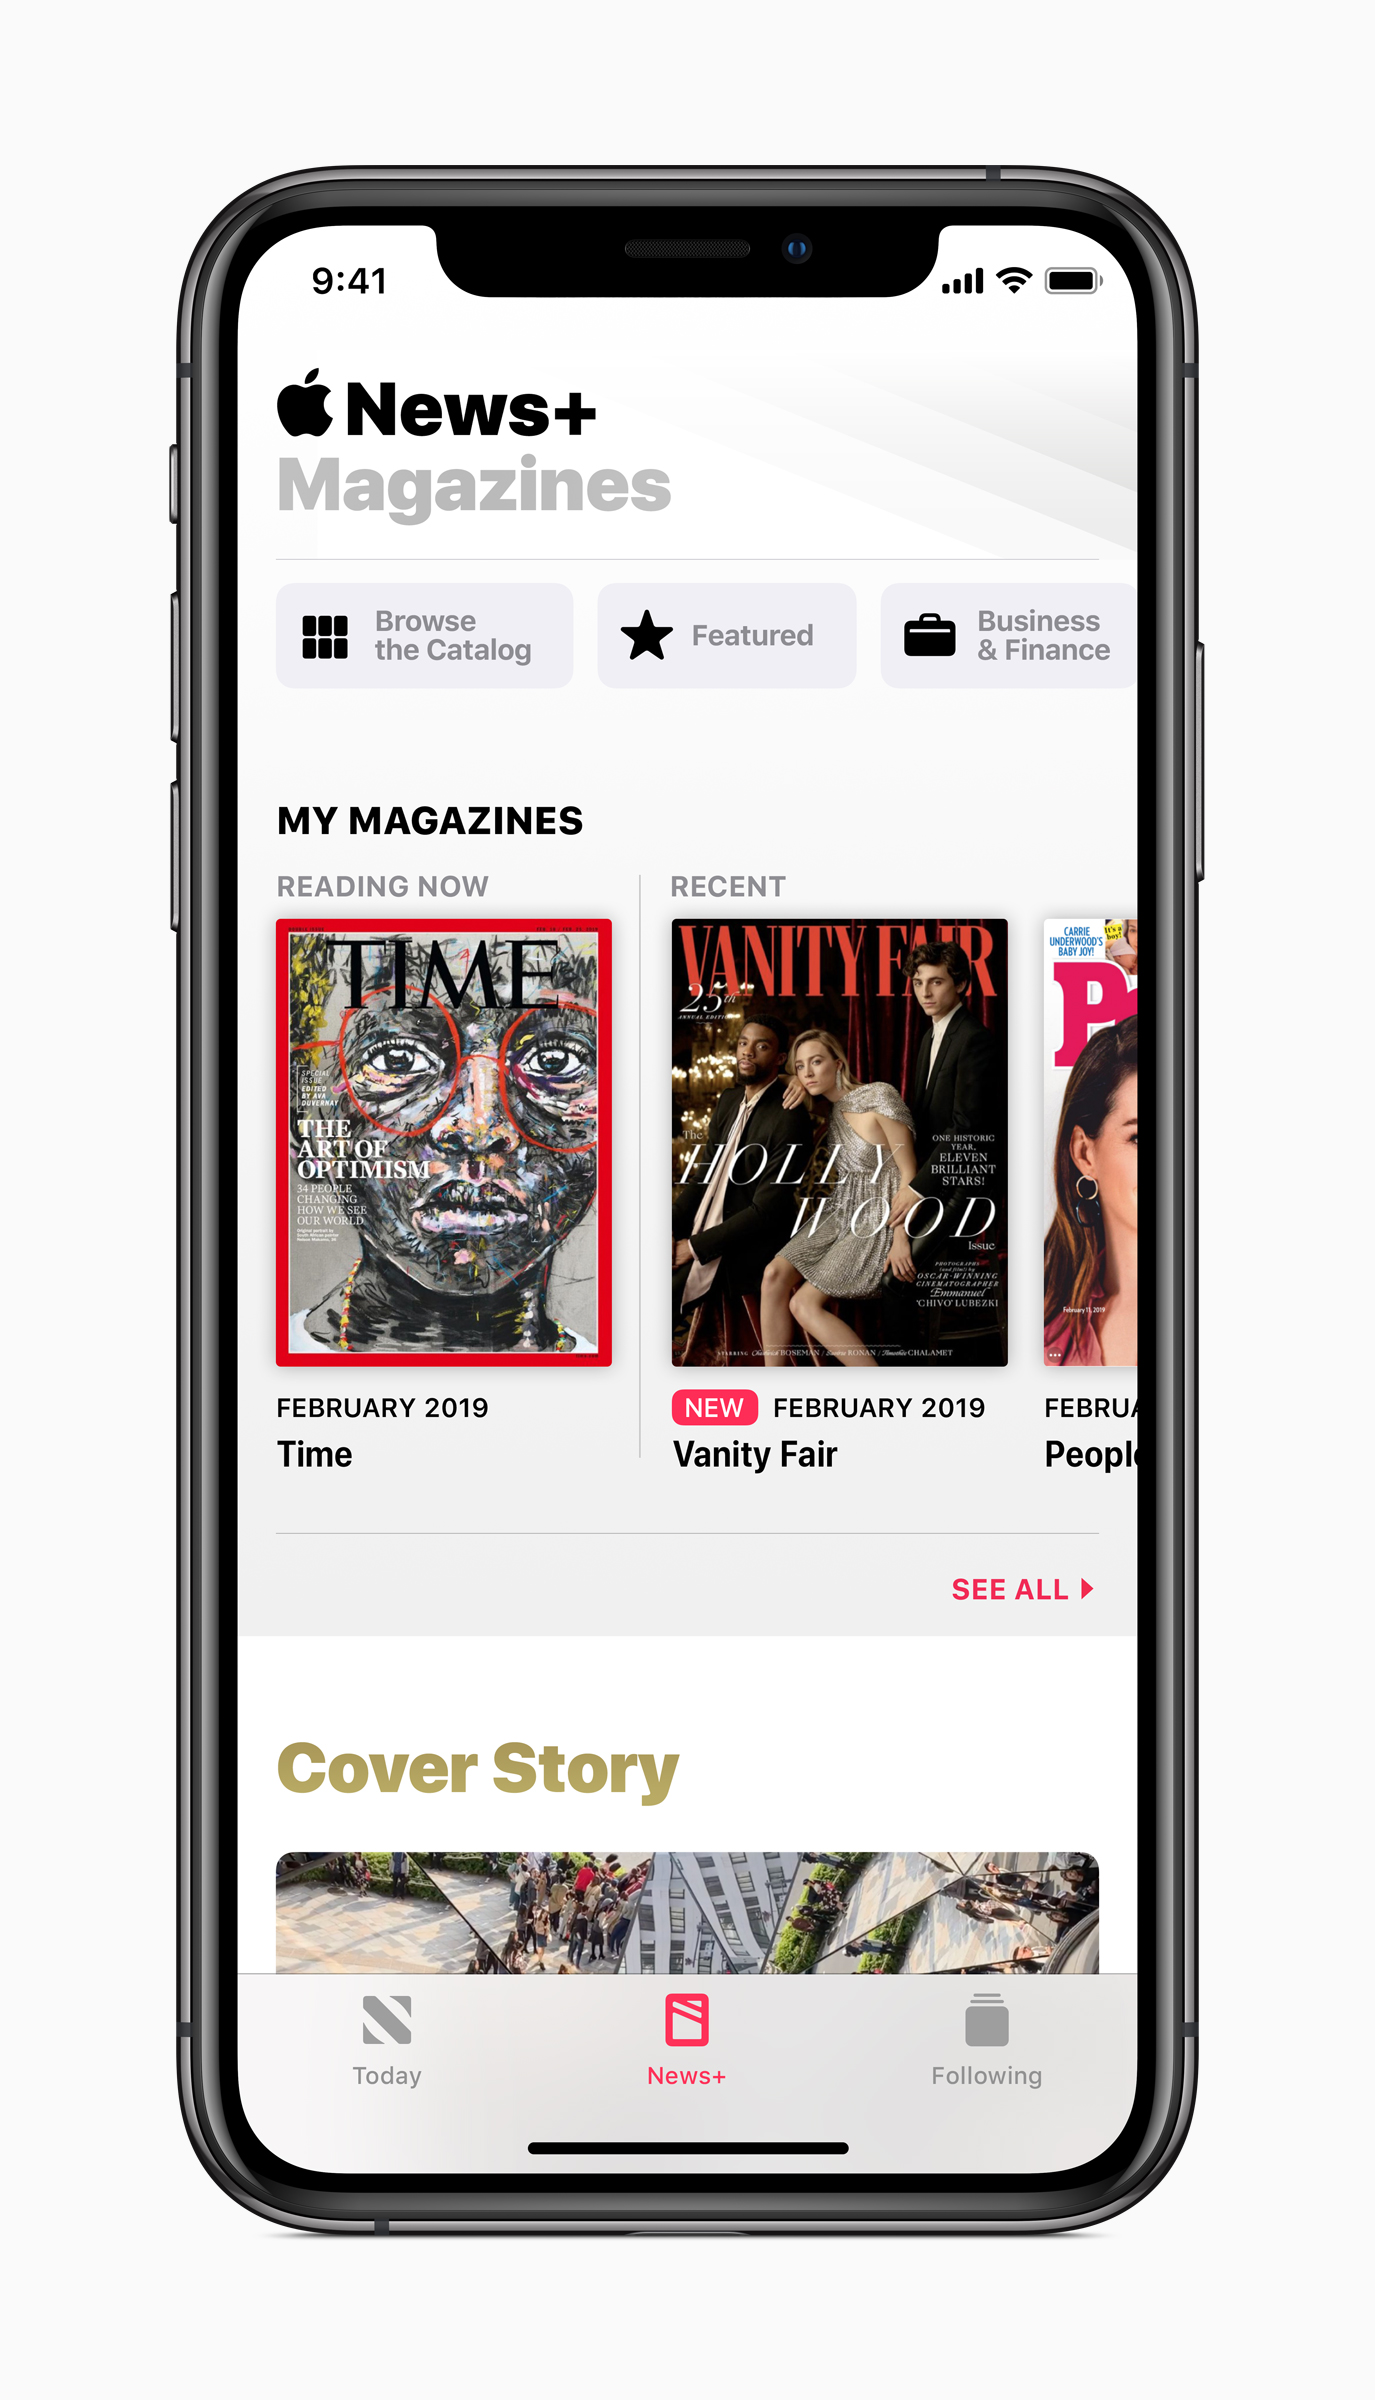 Apple-news-plus-magazines-iphone-screen-03252019.jpg